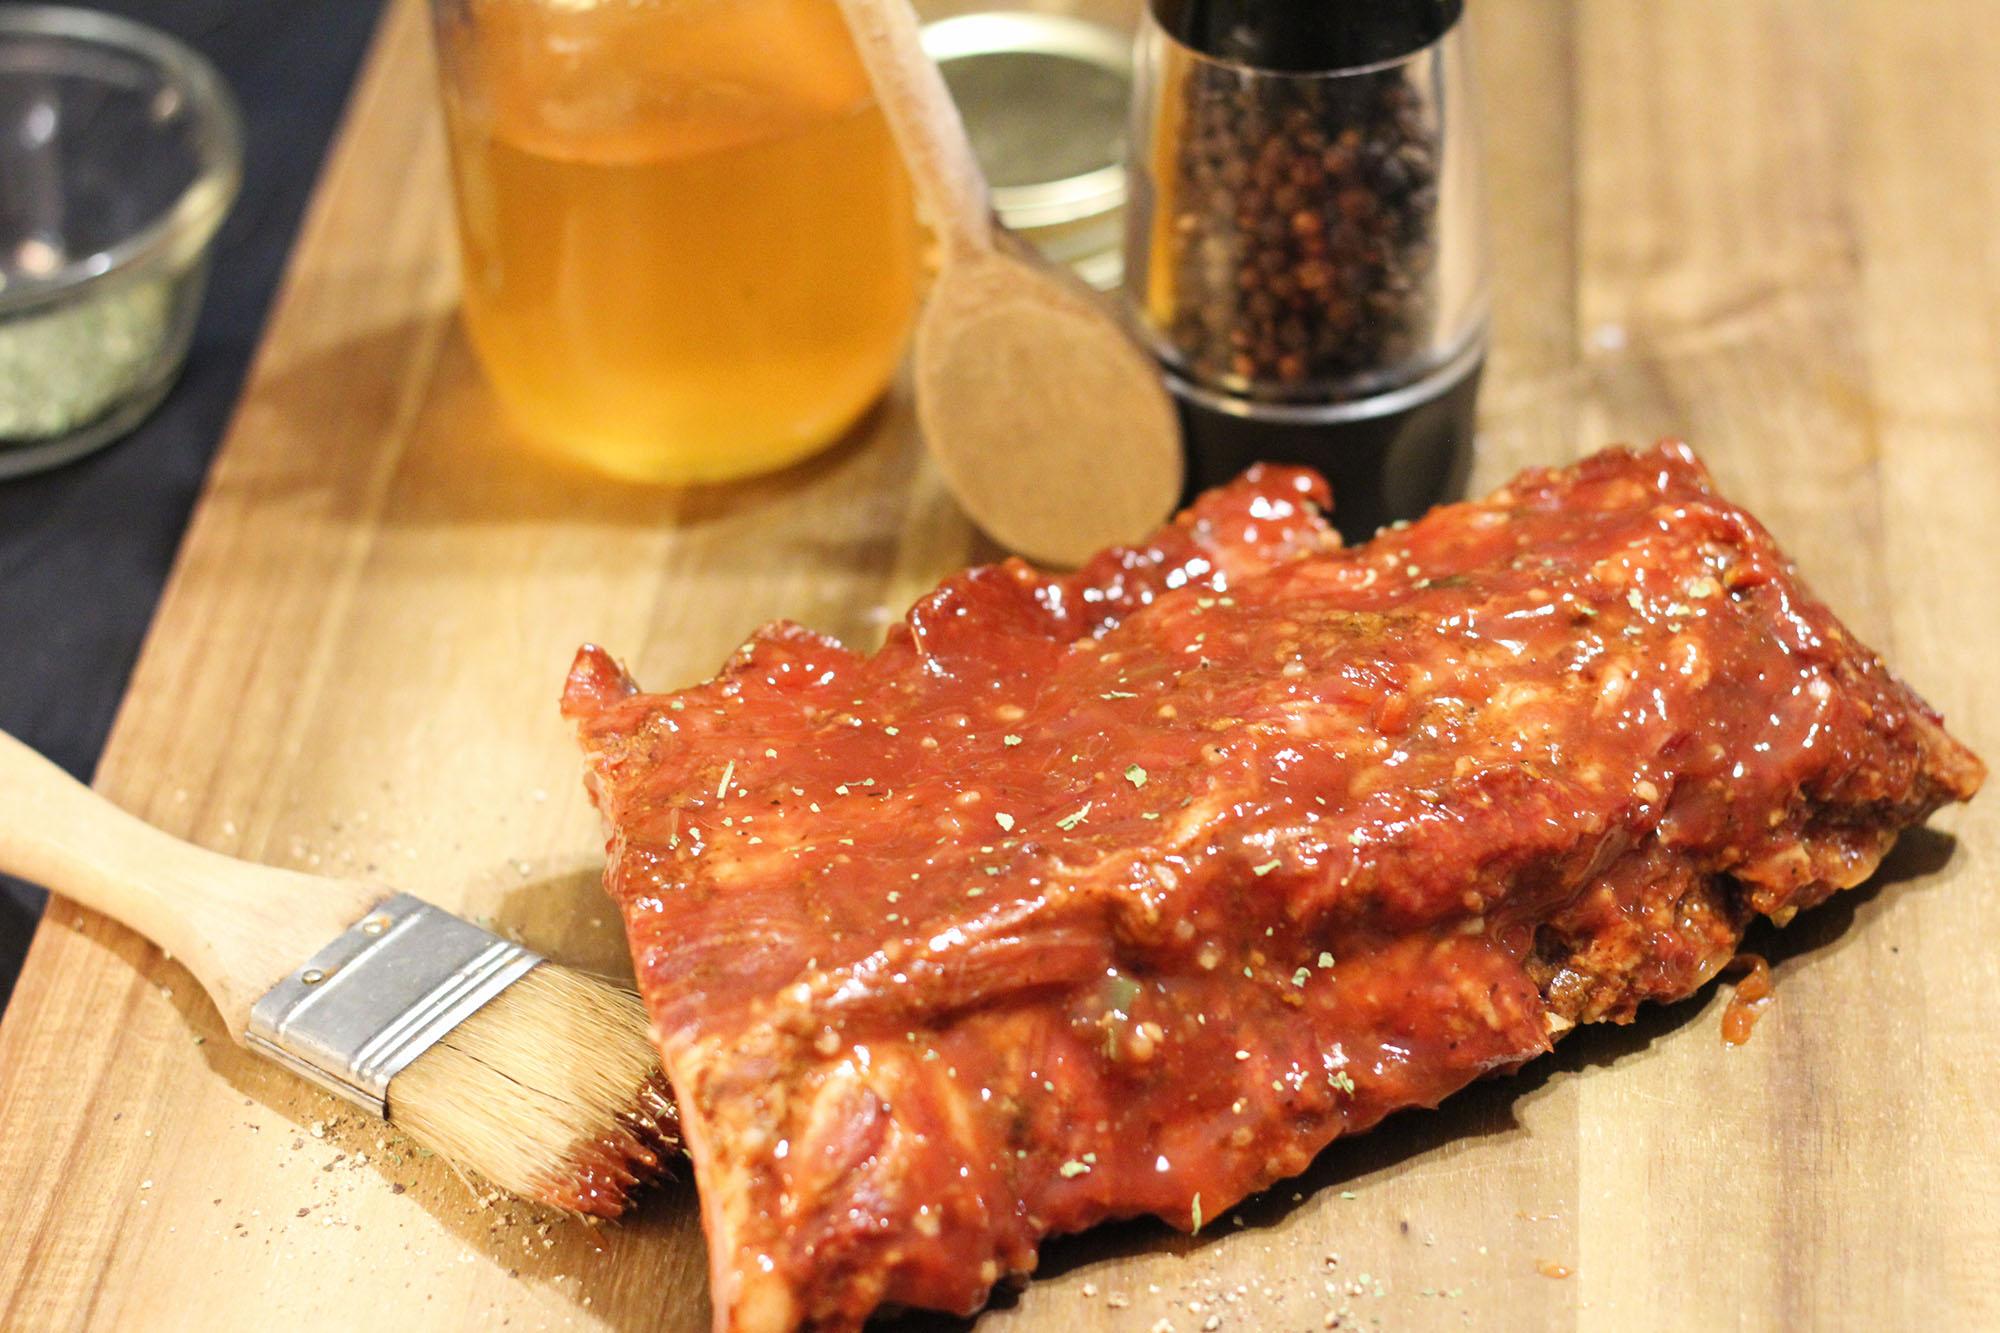 heat and eat ribs.jpg 2